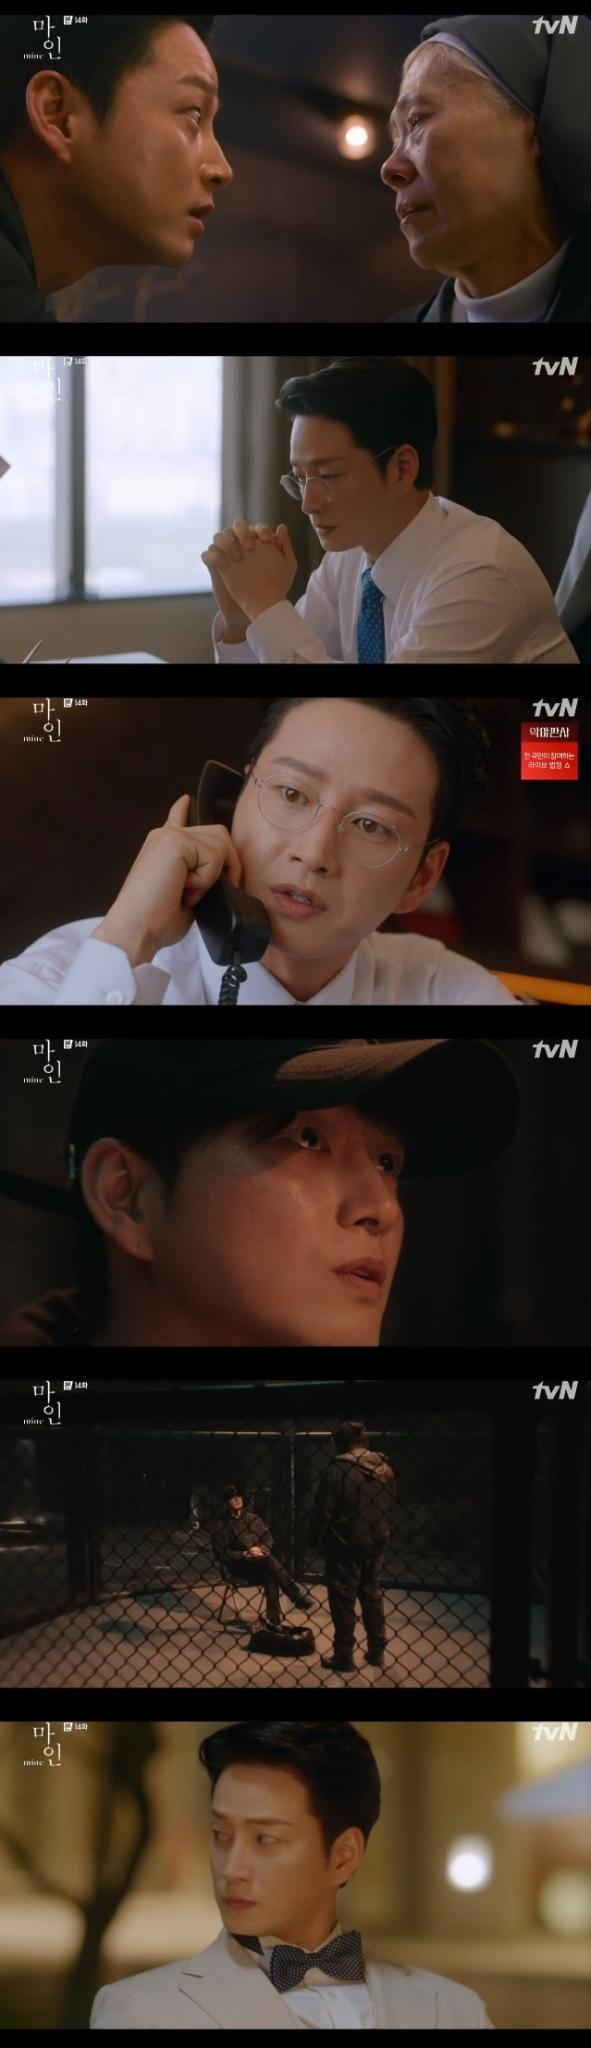 tvN 캡처 뉴스1